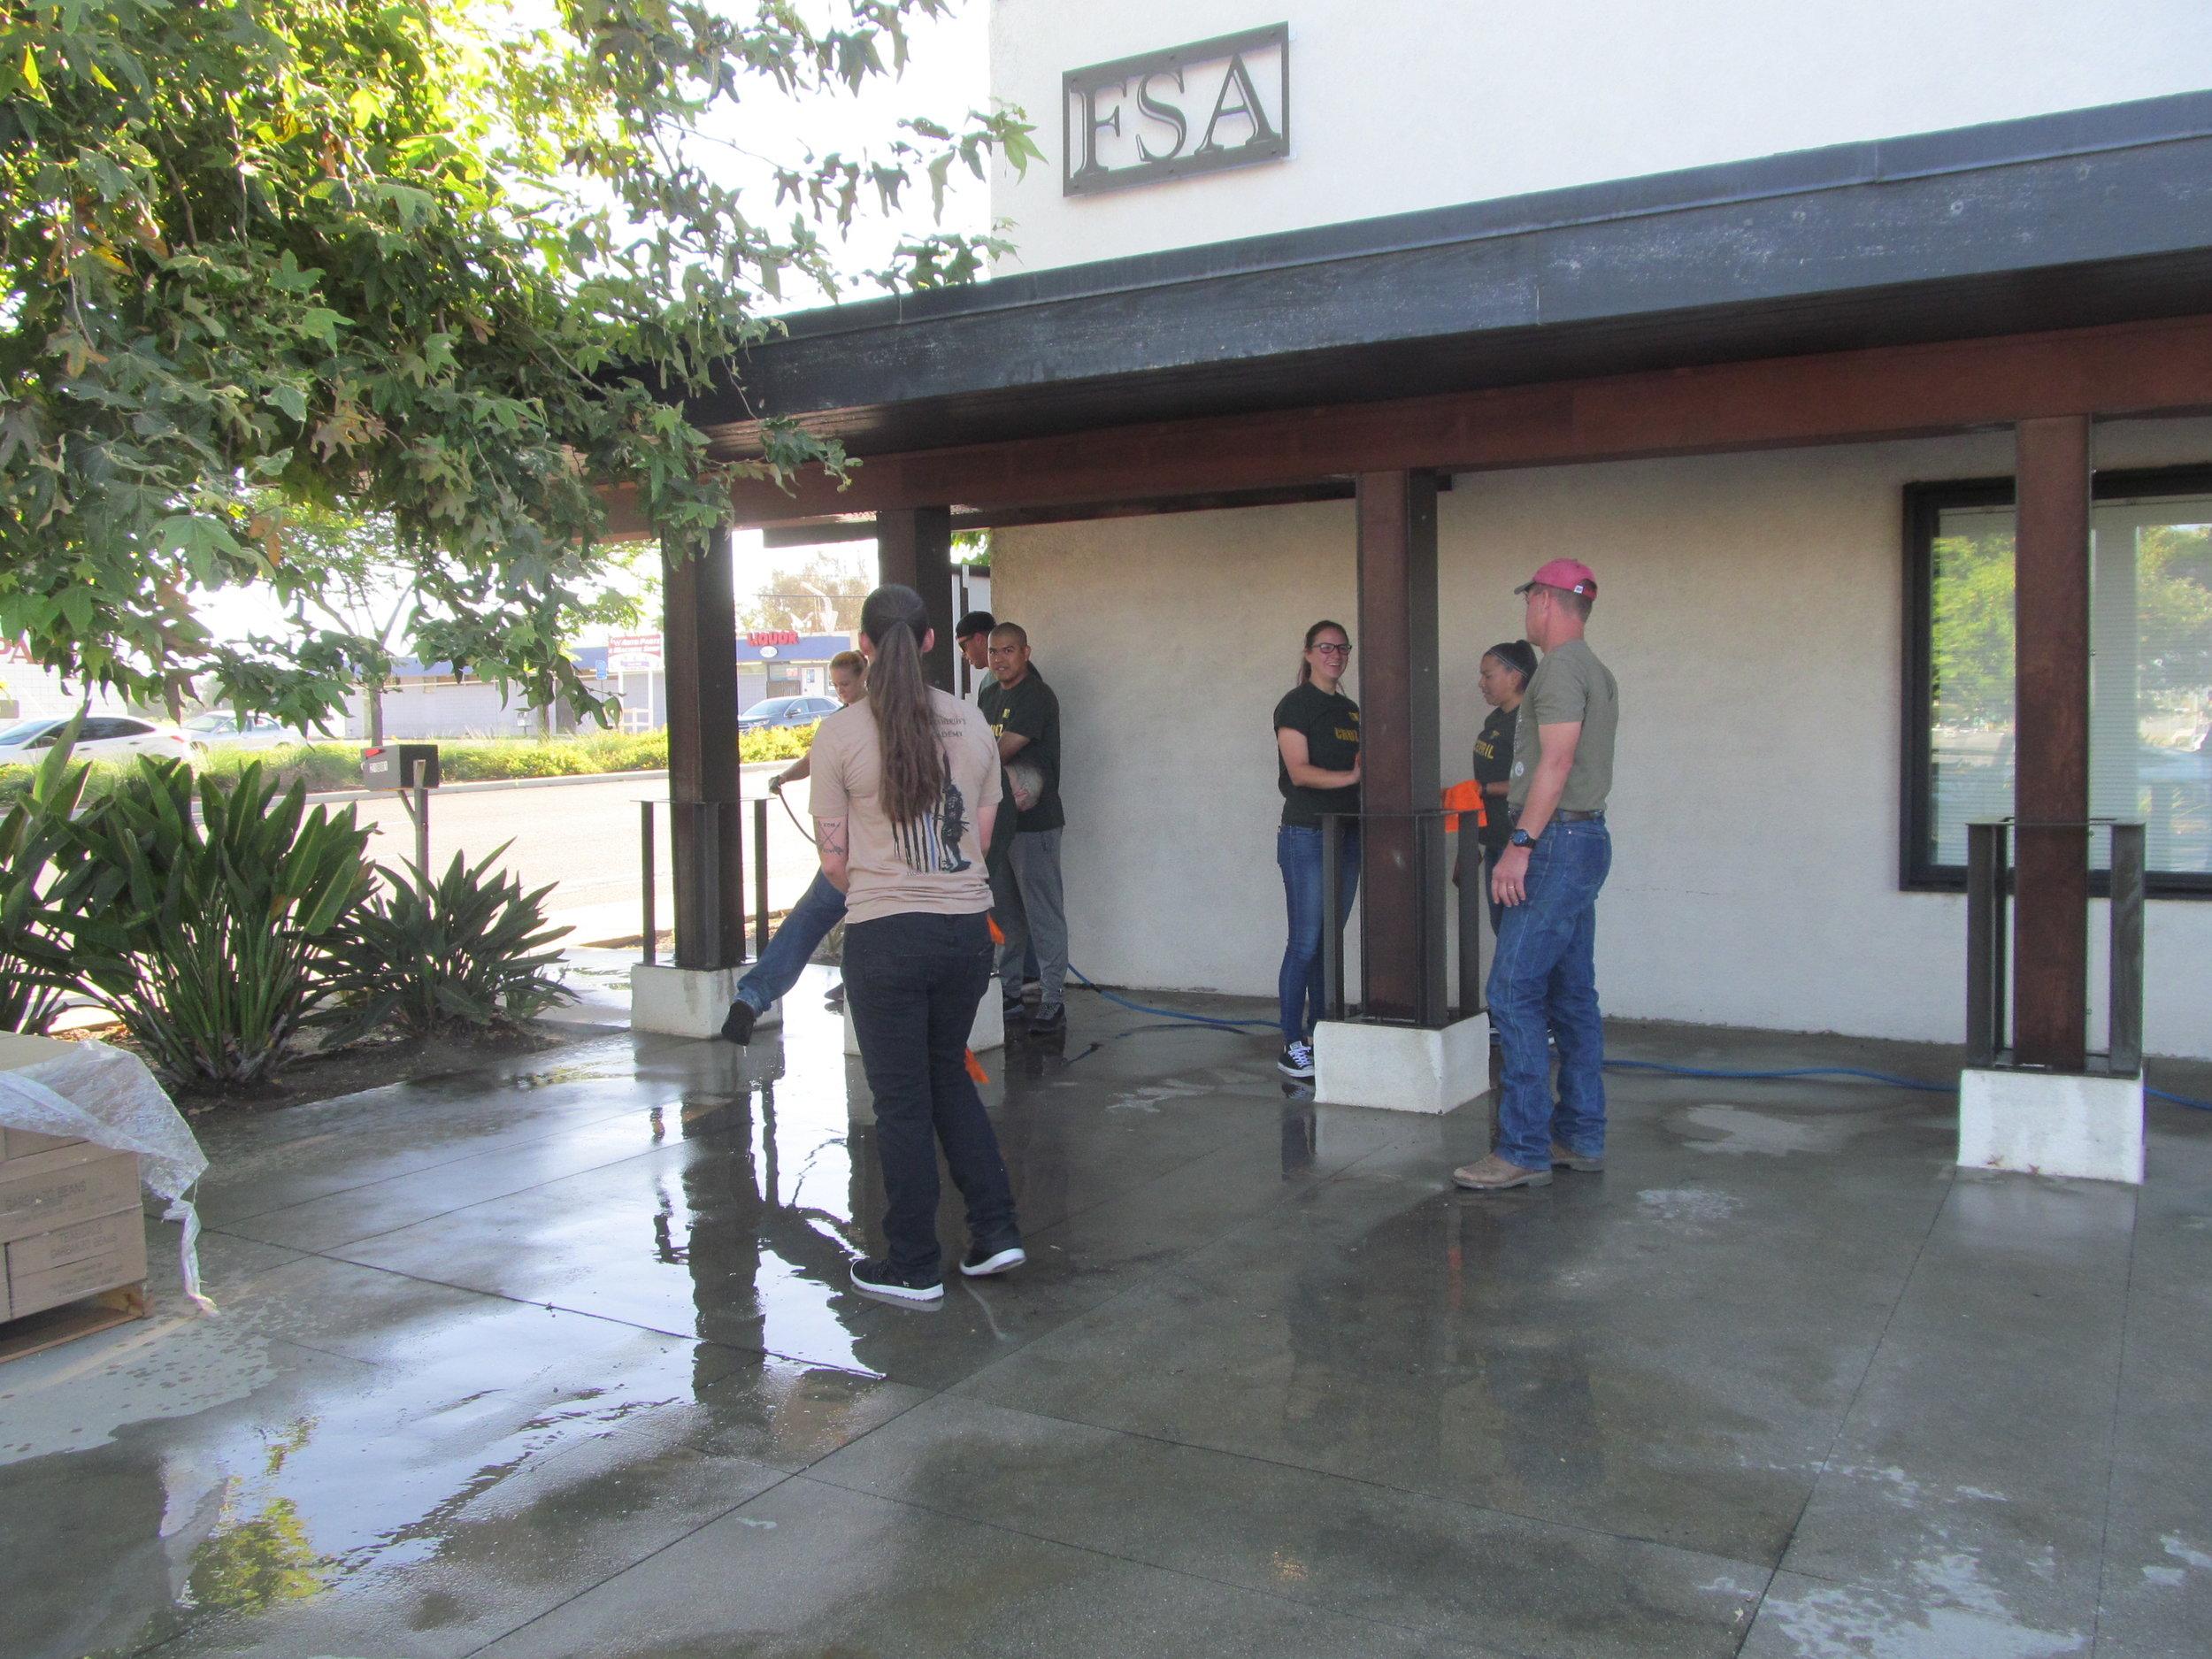 IMG_4213_Washing Building Exterior.JPG